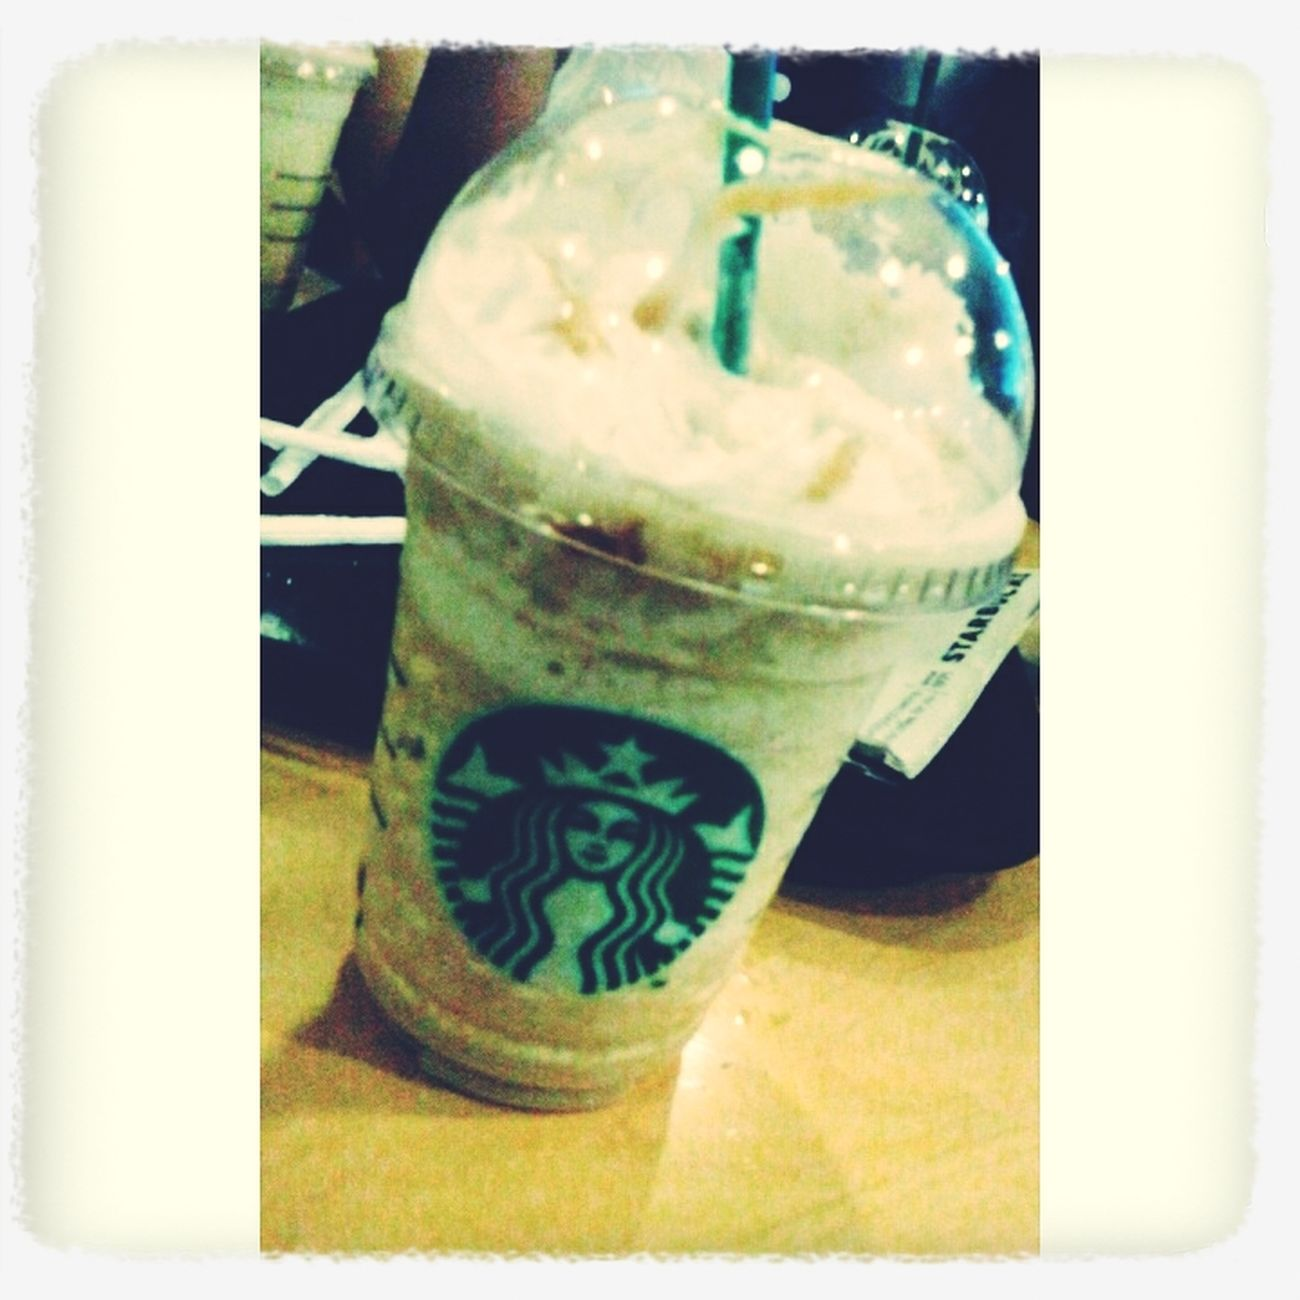 Starbucks Caramel Frap  Foodphotography Vscocam ❤❤